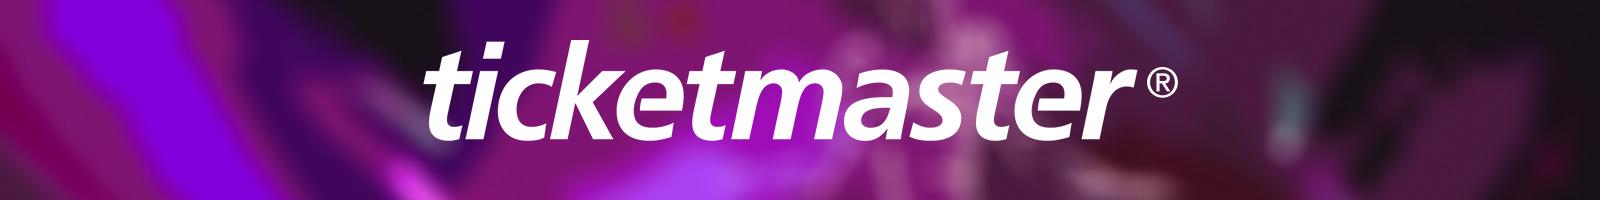 ticketmaster banner logo